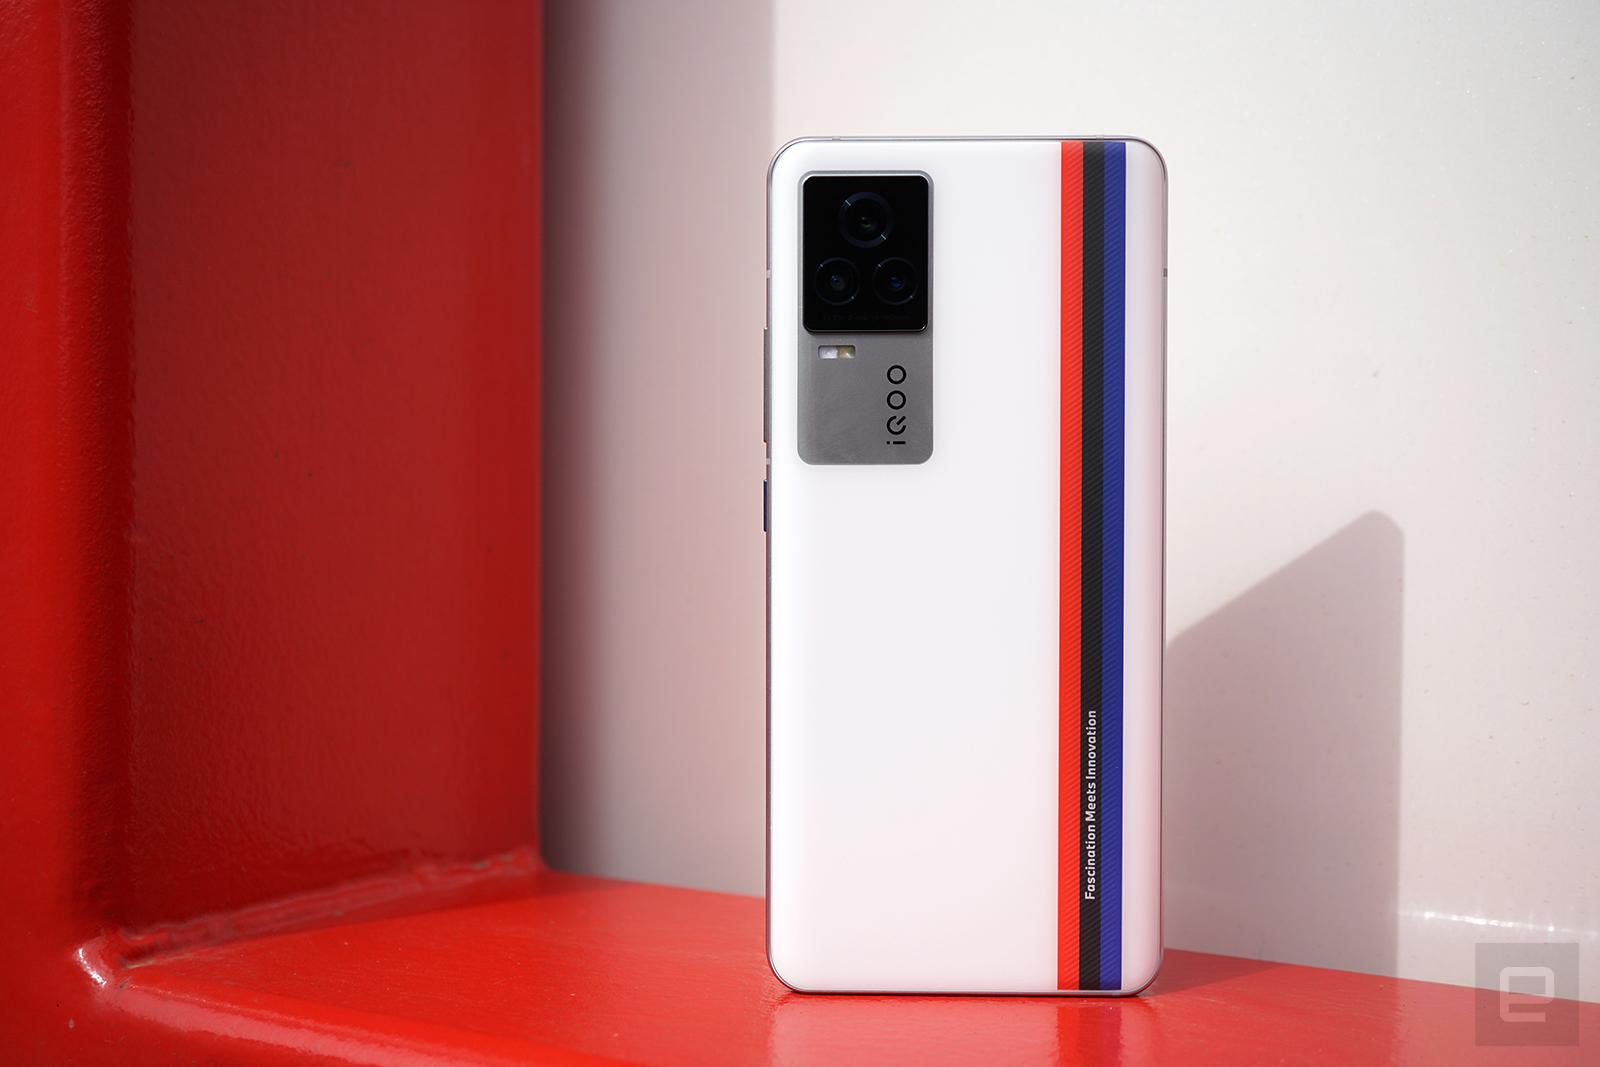 iQOO 7 評測  去年 iQOO 5 系列的兩台手機,憑藉在外觀、拍照、充電這幾項重要特性上的發力,可以說在市場中出了不少的風頭,堪稱品牌創立之後真正的集大成之作。那珠玉在前,今年的新機該如何打造?「快」字當先又能「全感操控」的 iQOO 7 便是廠方交出的答卷。